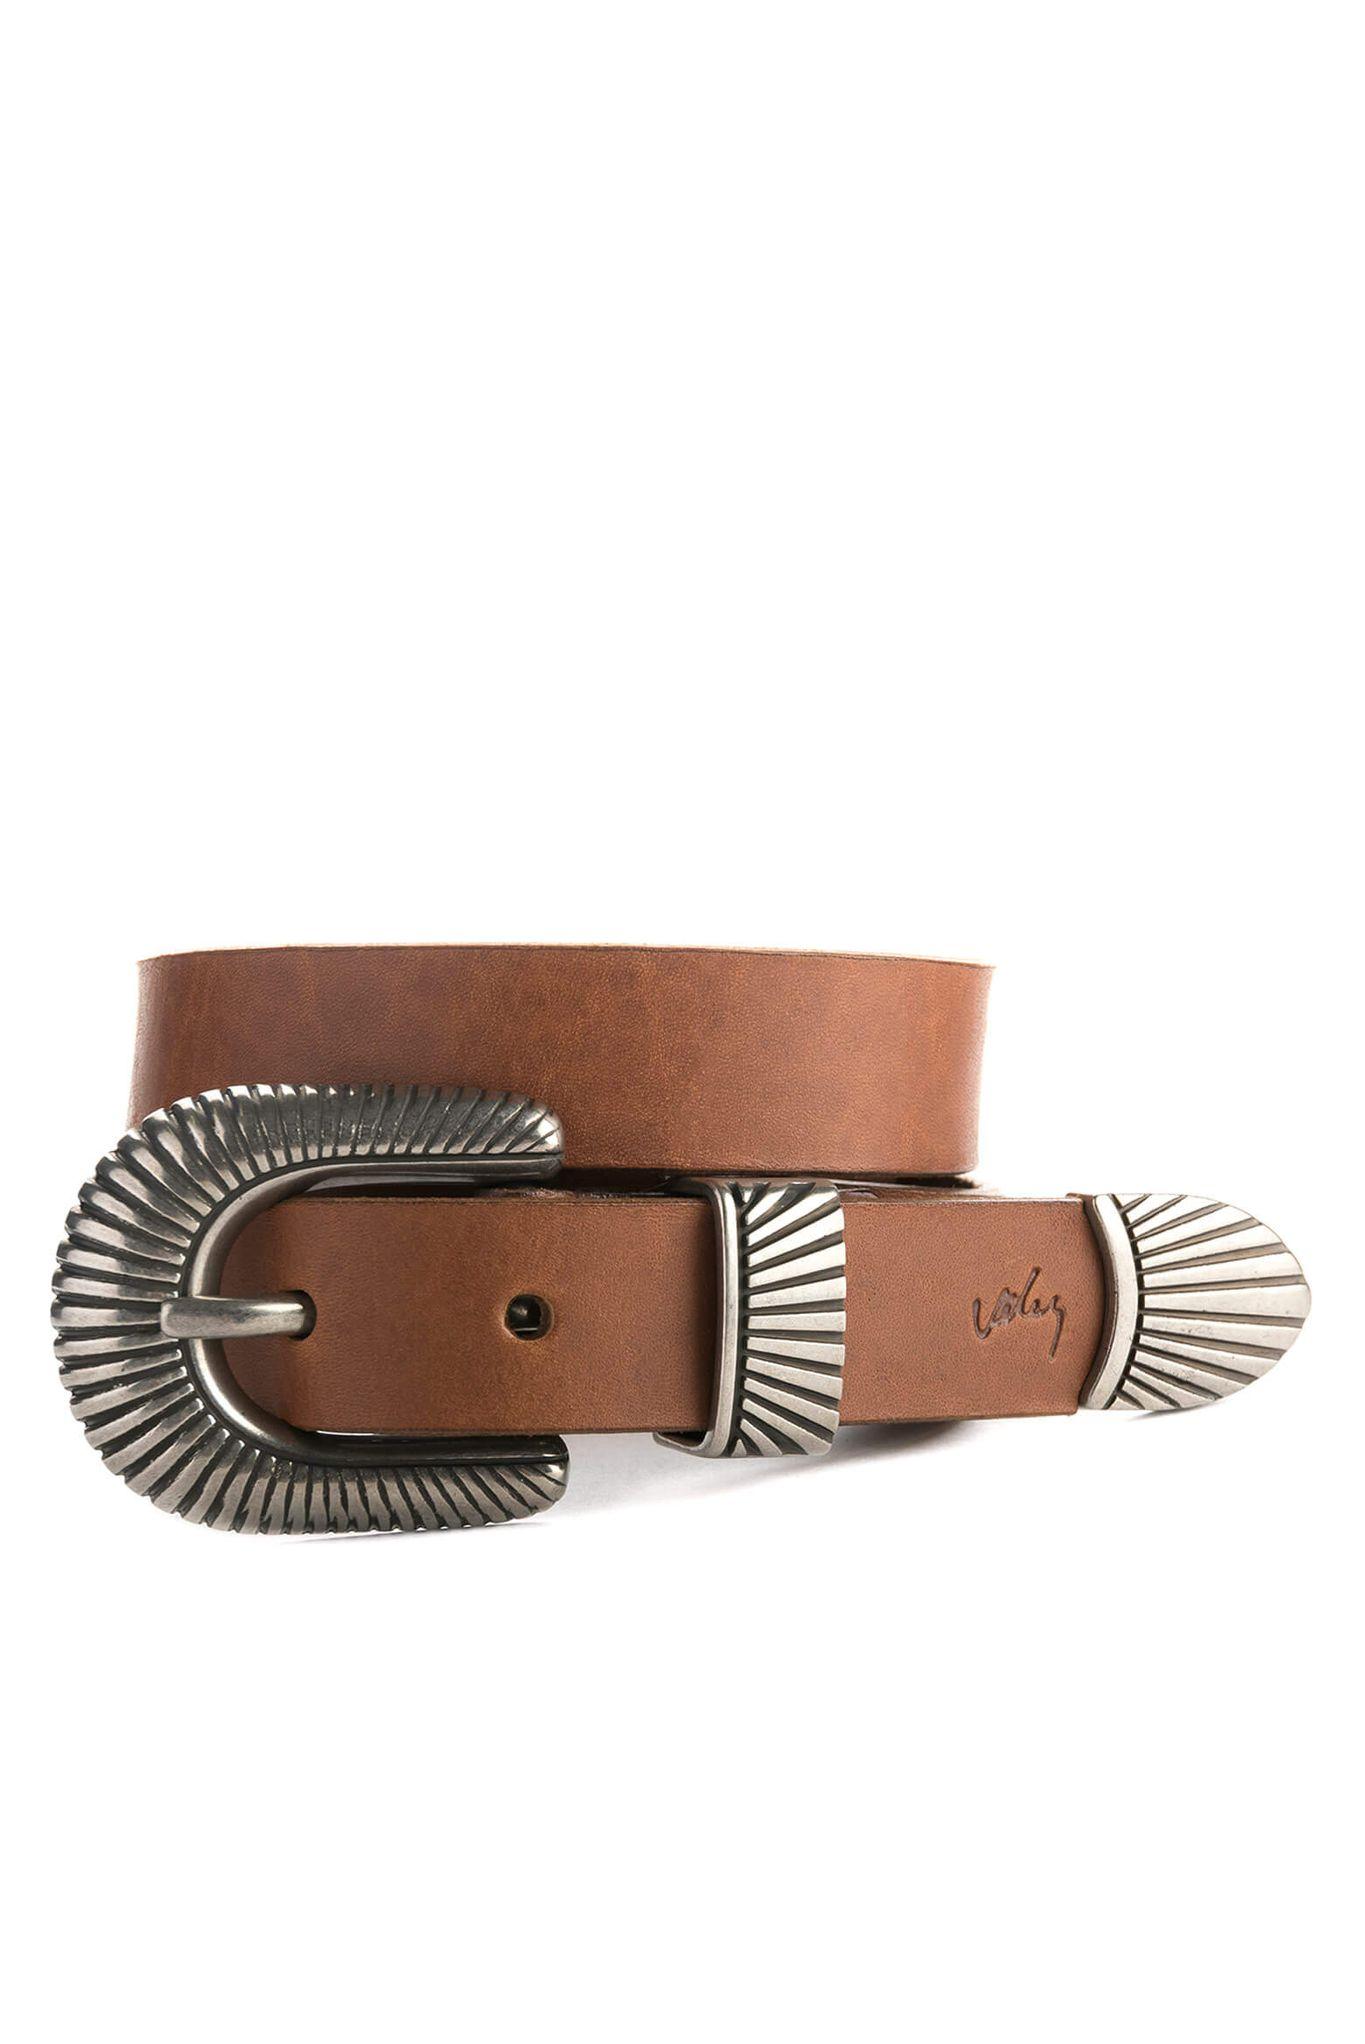 4b3d6cfdb Cinturón unifaz de cuero para mujer 21244 | Unifaz | Vélez - Velez-18